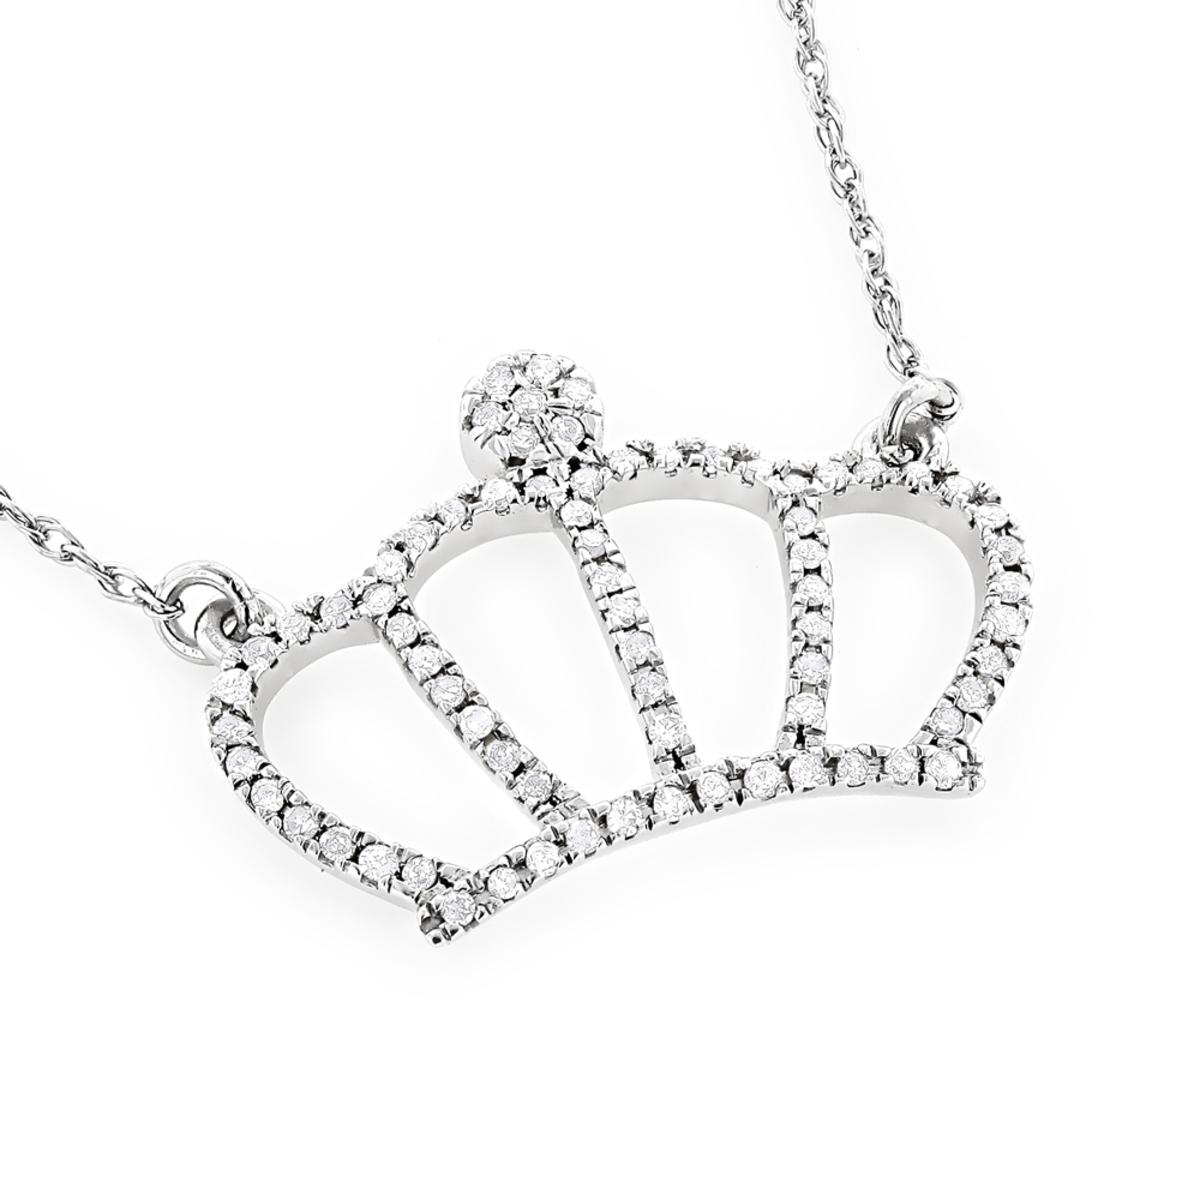 14K Gold Womens Diamond Crown Pendant Necklace 0.15ct